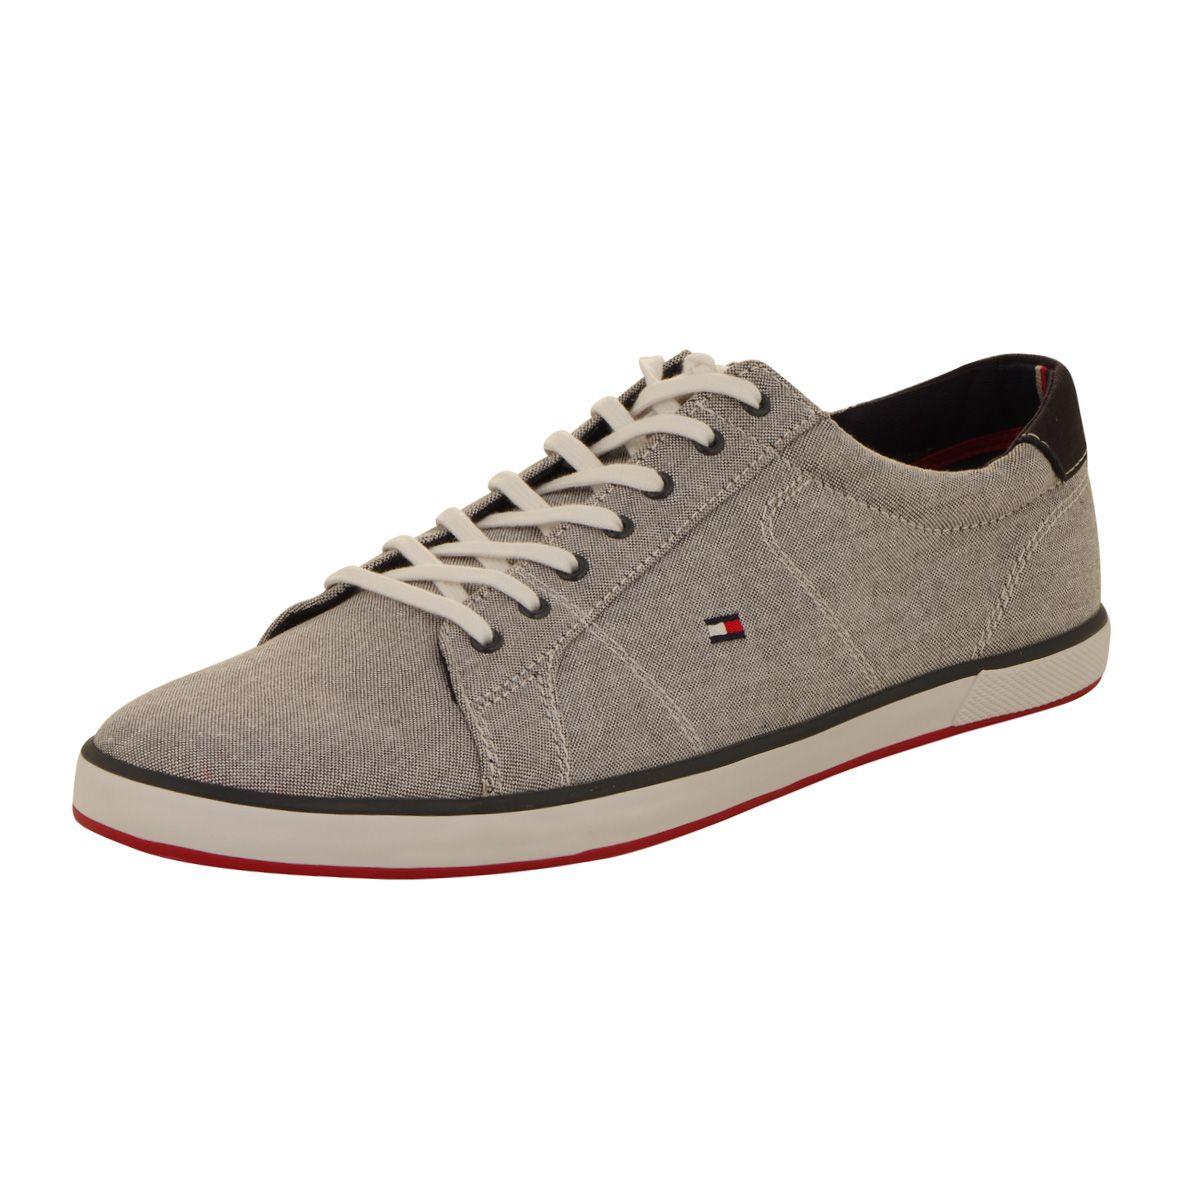 chaussures sneackers grises grande taille du 46 au 48 size factory tommy hilfiger. Black Bedroom Furniture Sets. Home Design Ideas